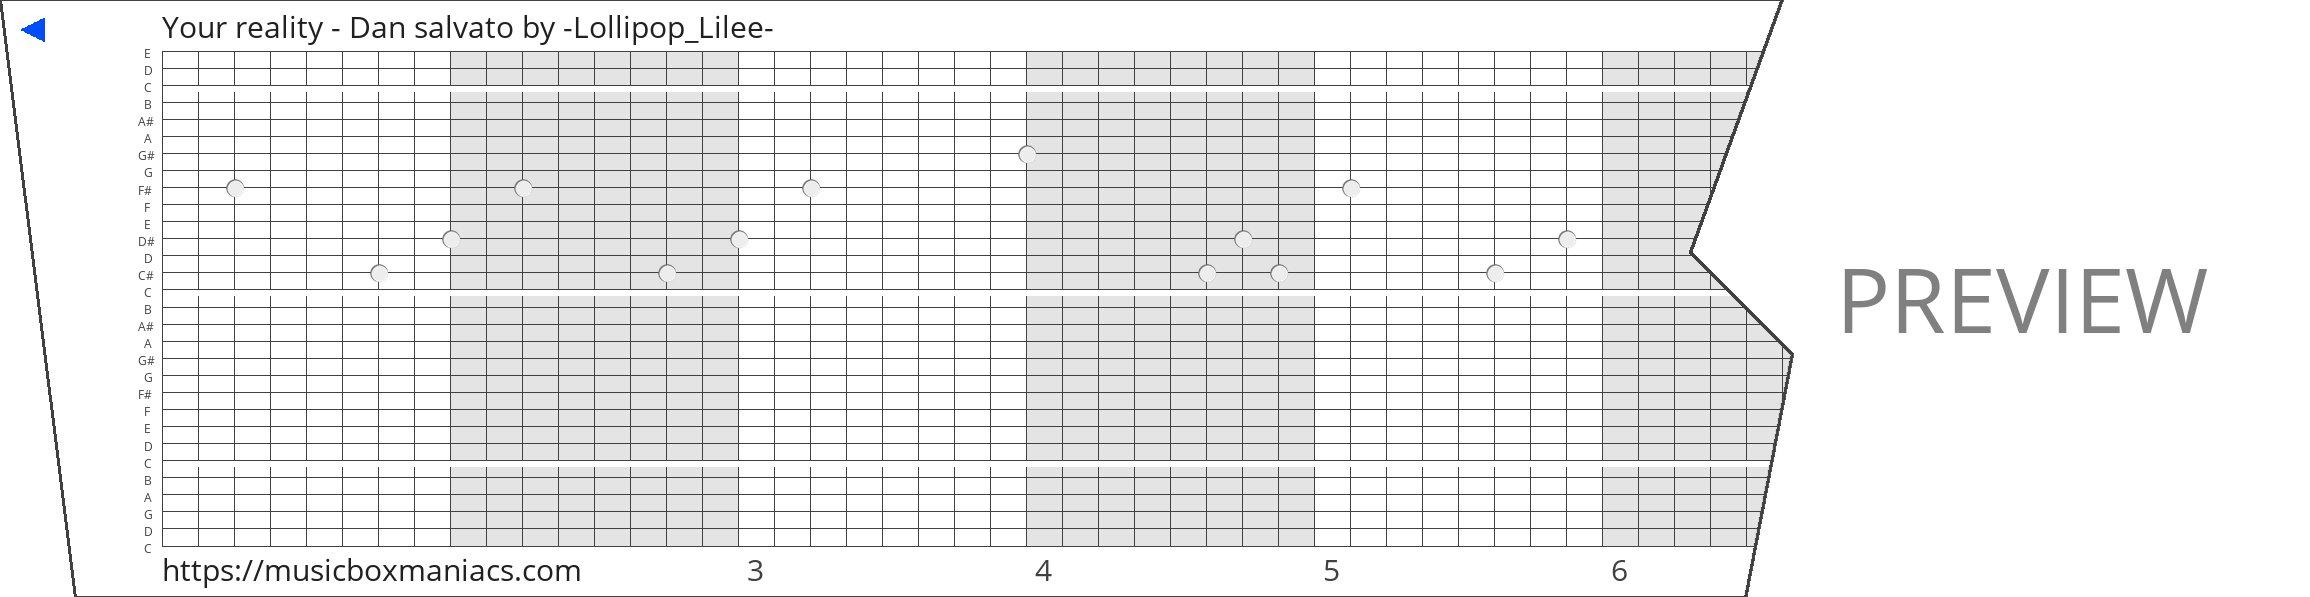 Your reality - Dan salvato 30 note music box paper strip